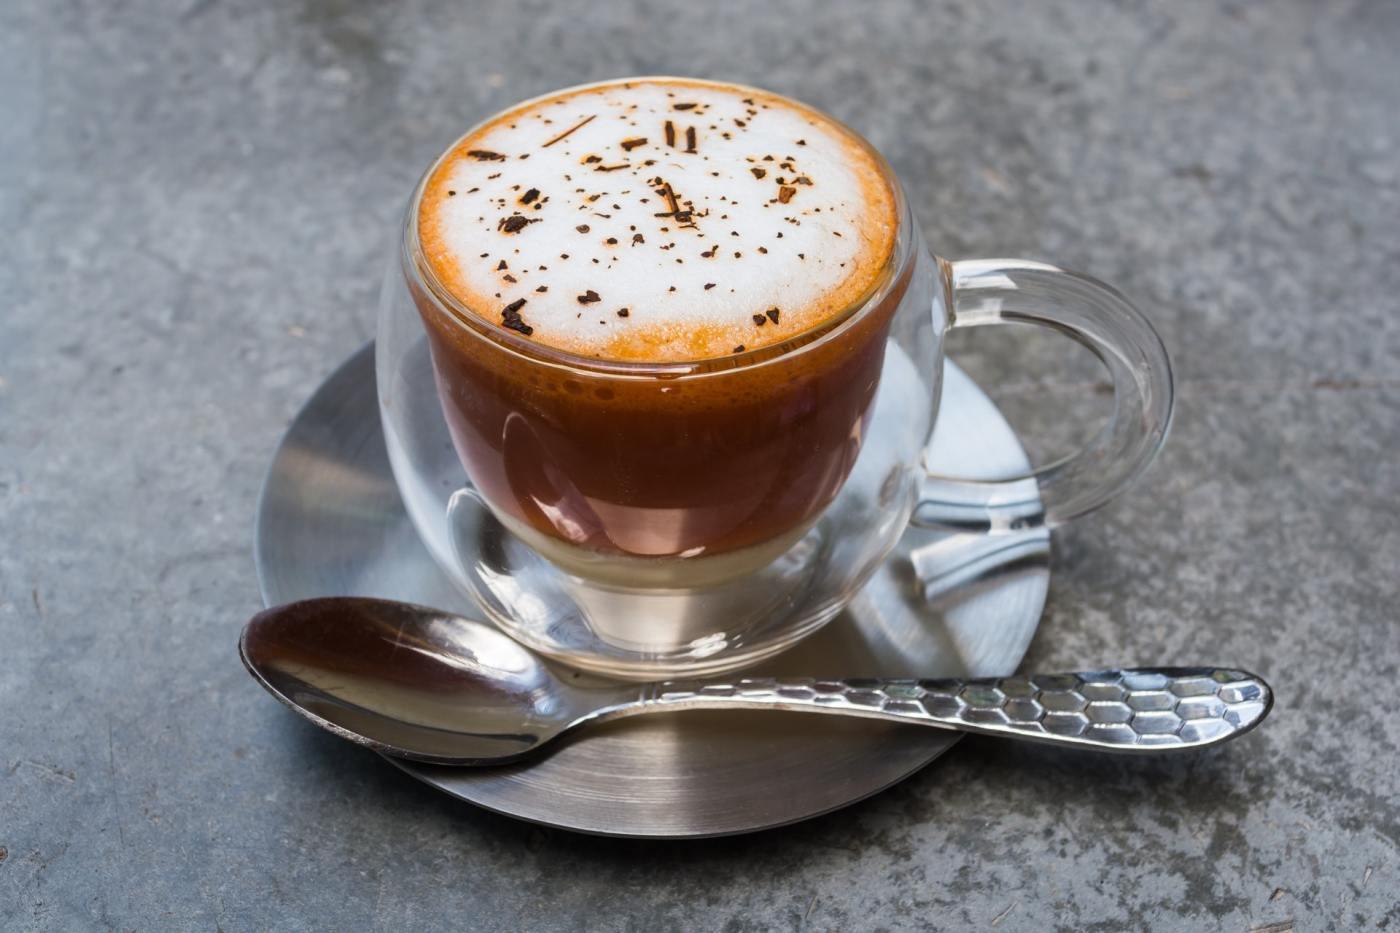 Café à Abidjan, kézako?,serial foodie, afroepicurien, abidjan, cote d'ivoire, café abidjan